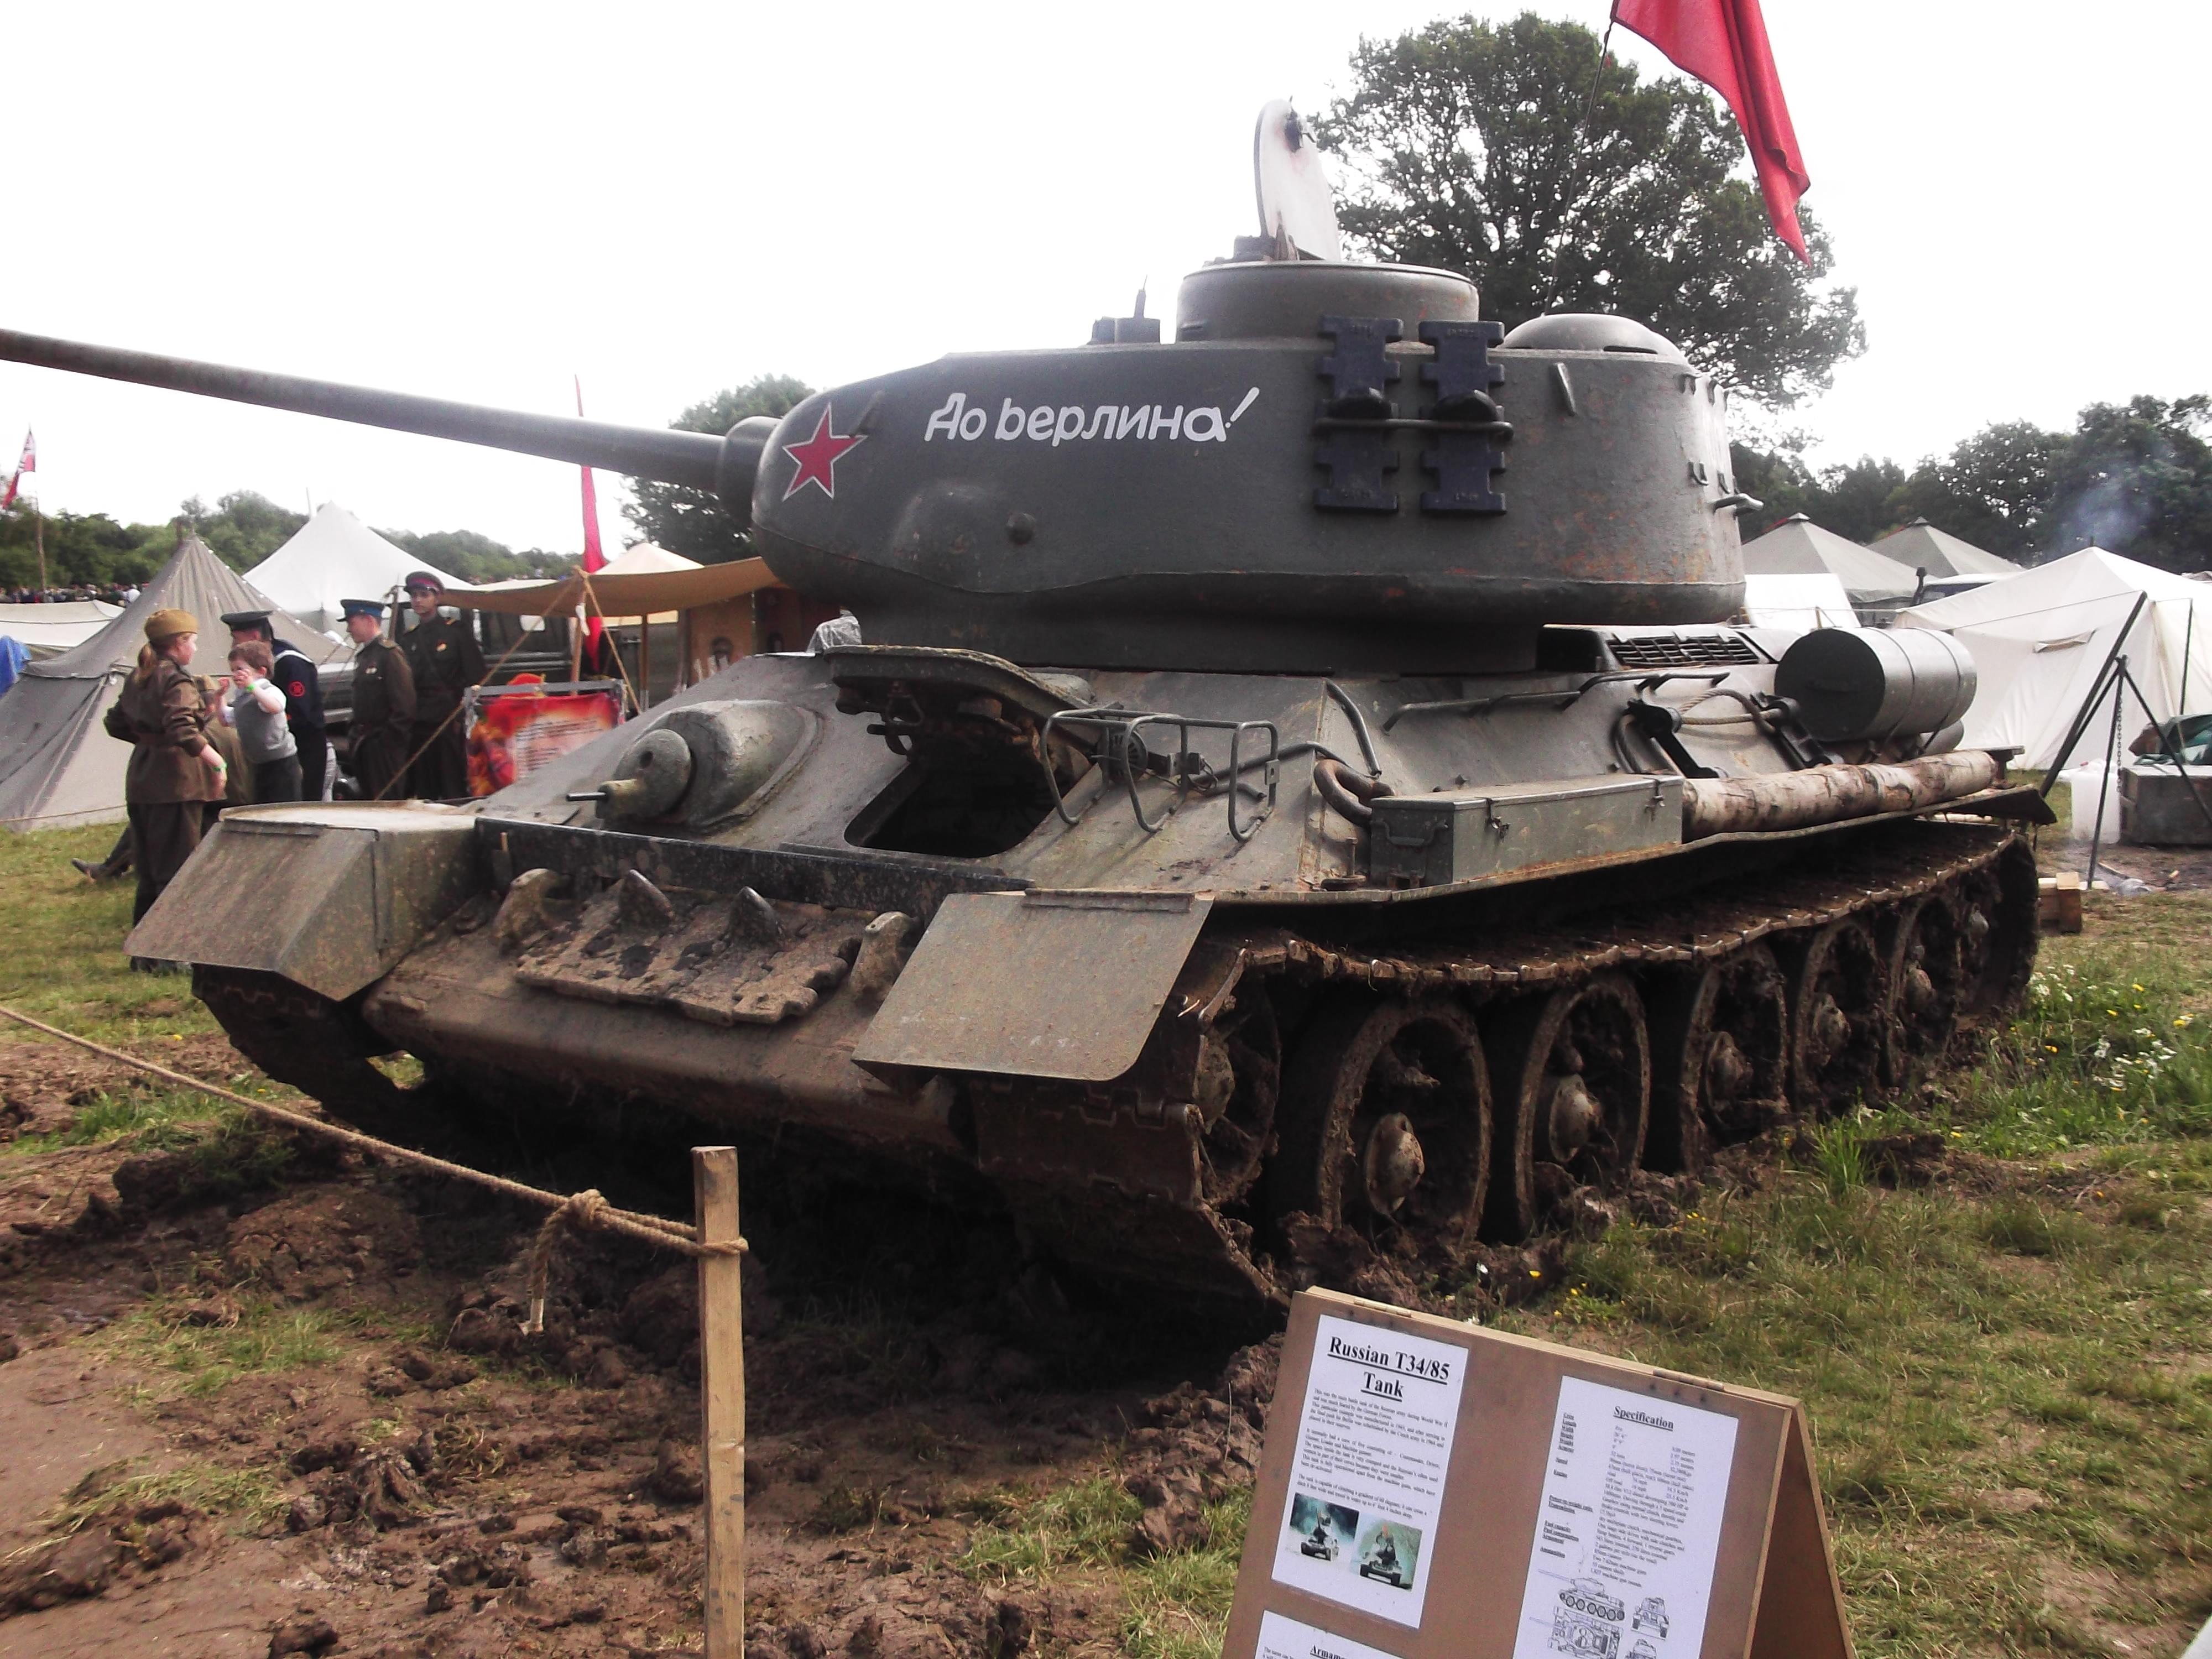 T 34 85 at Paddock wood by FFDP-Neko